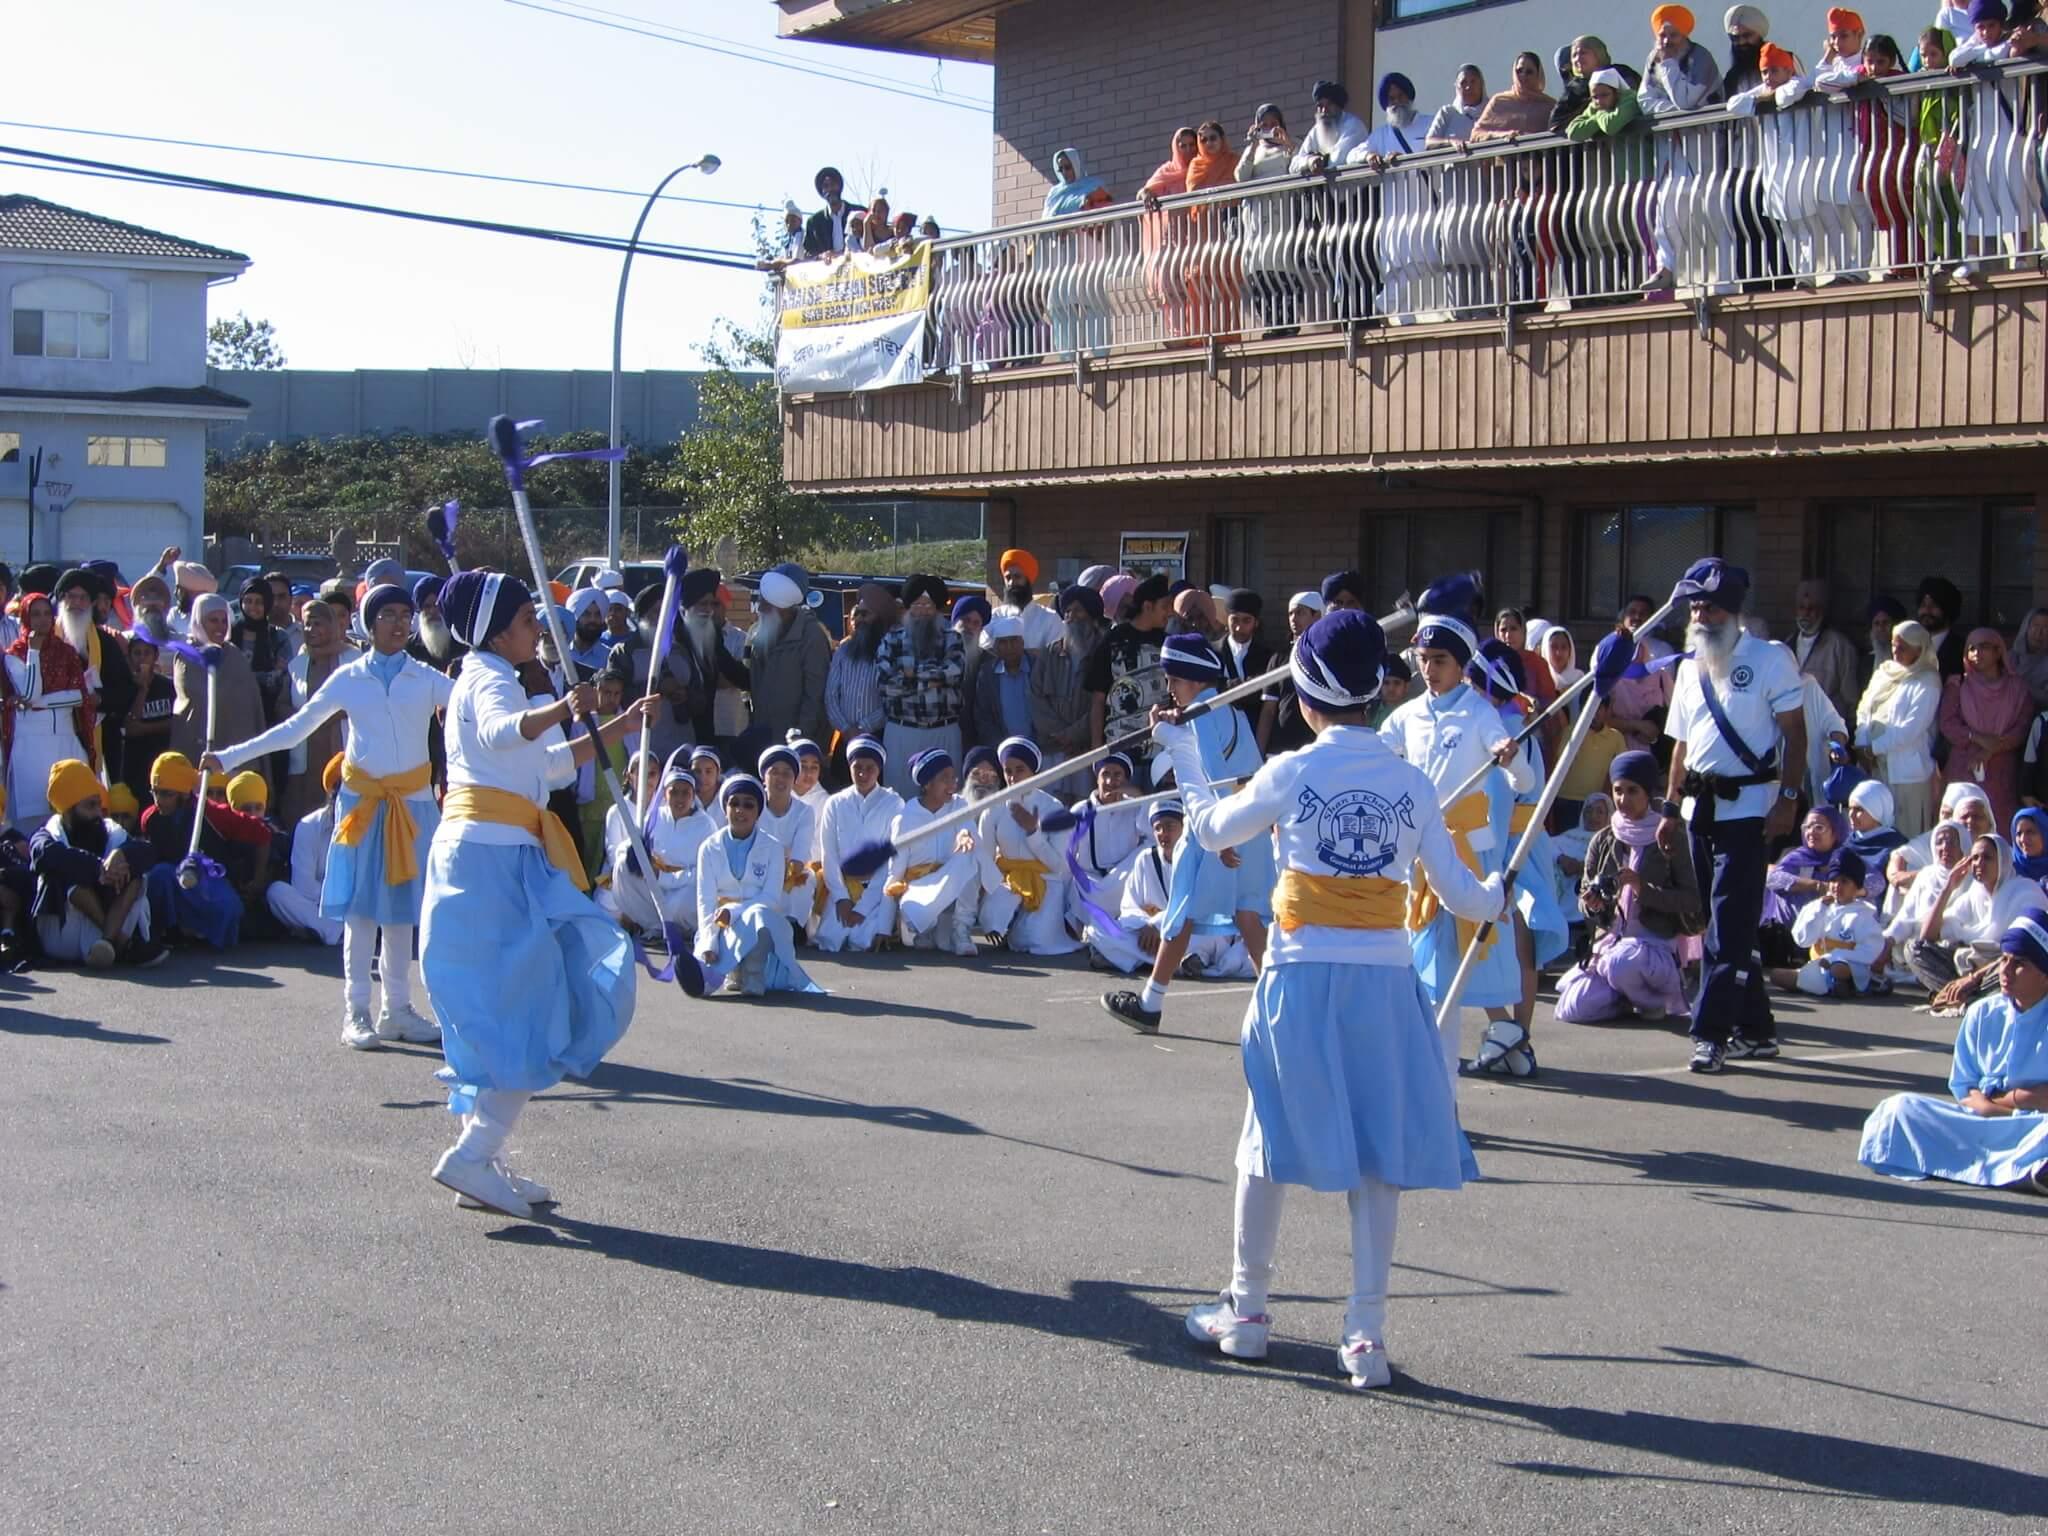 Sikh students performing gatka (sikh martial arts)